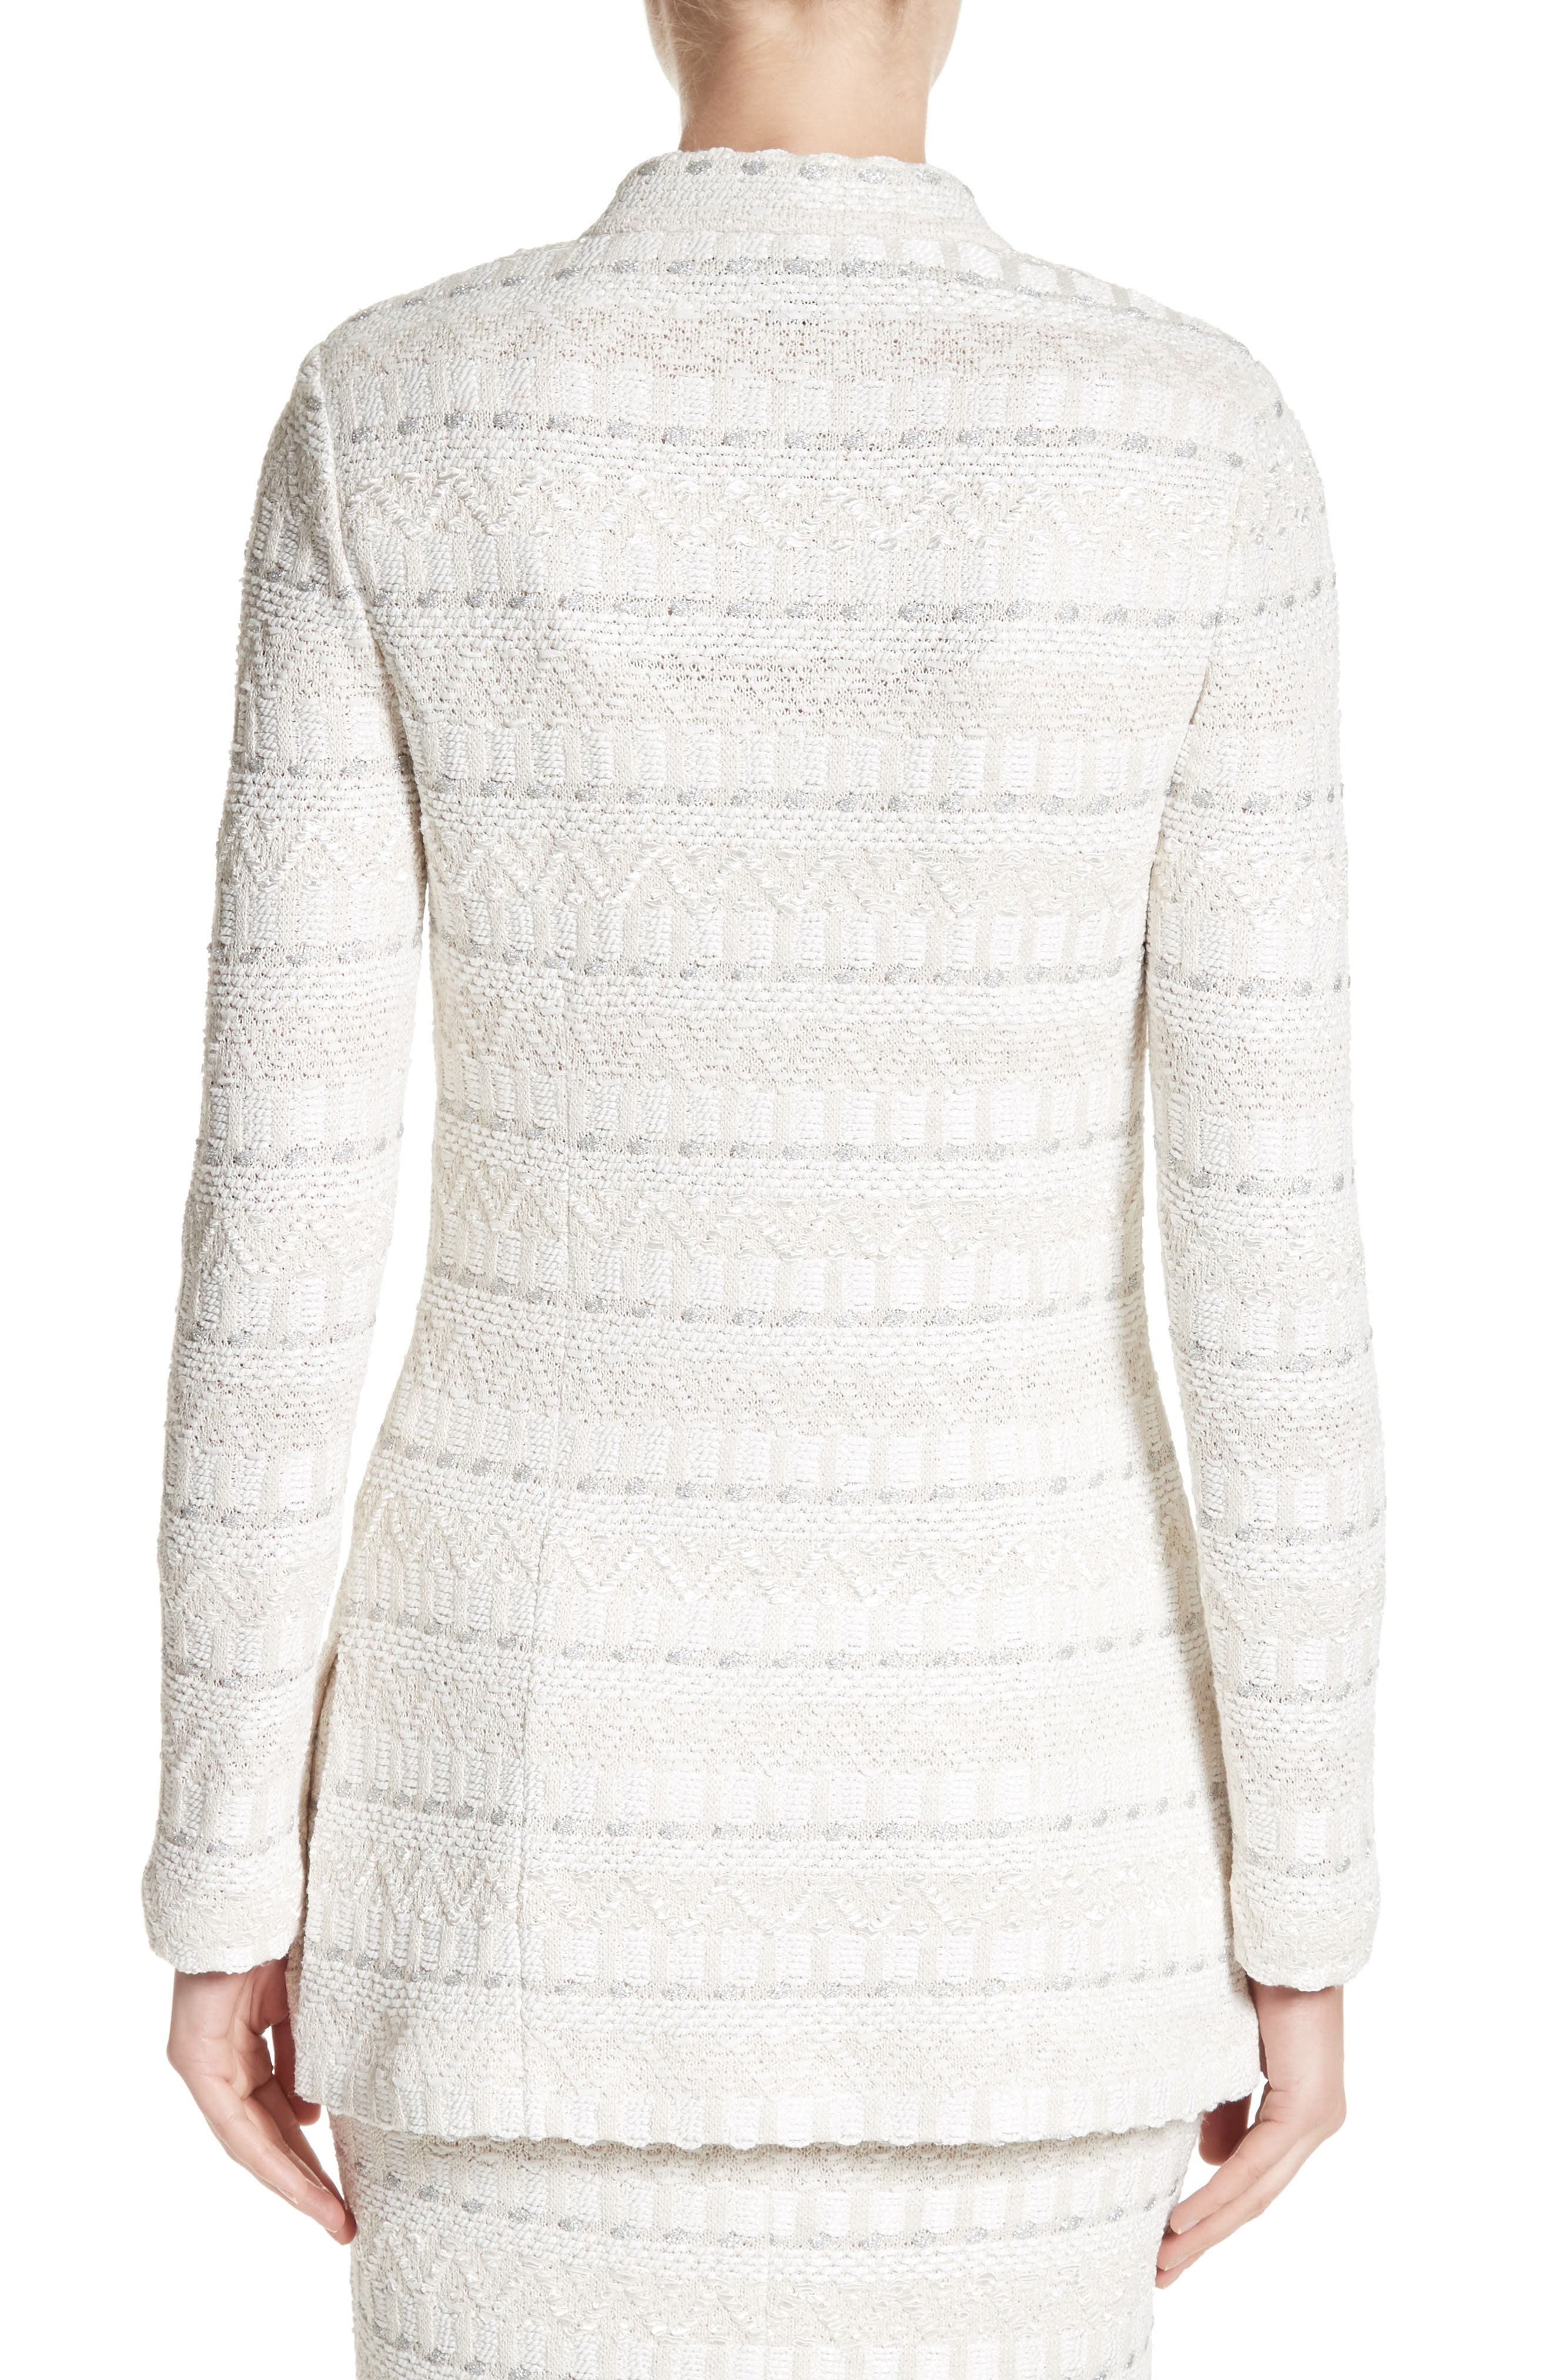 Samar Knit Tweed Jacket,                             Alternate thumbnail 2, color,                             100